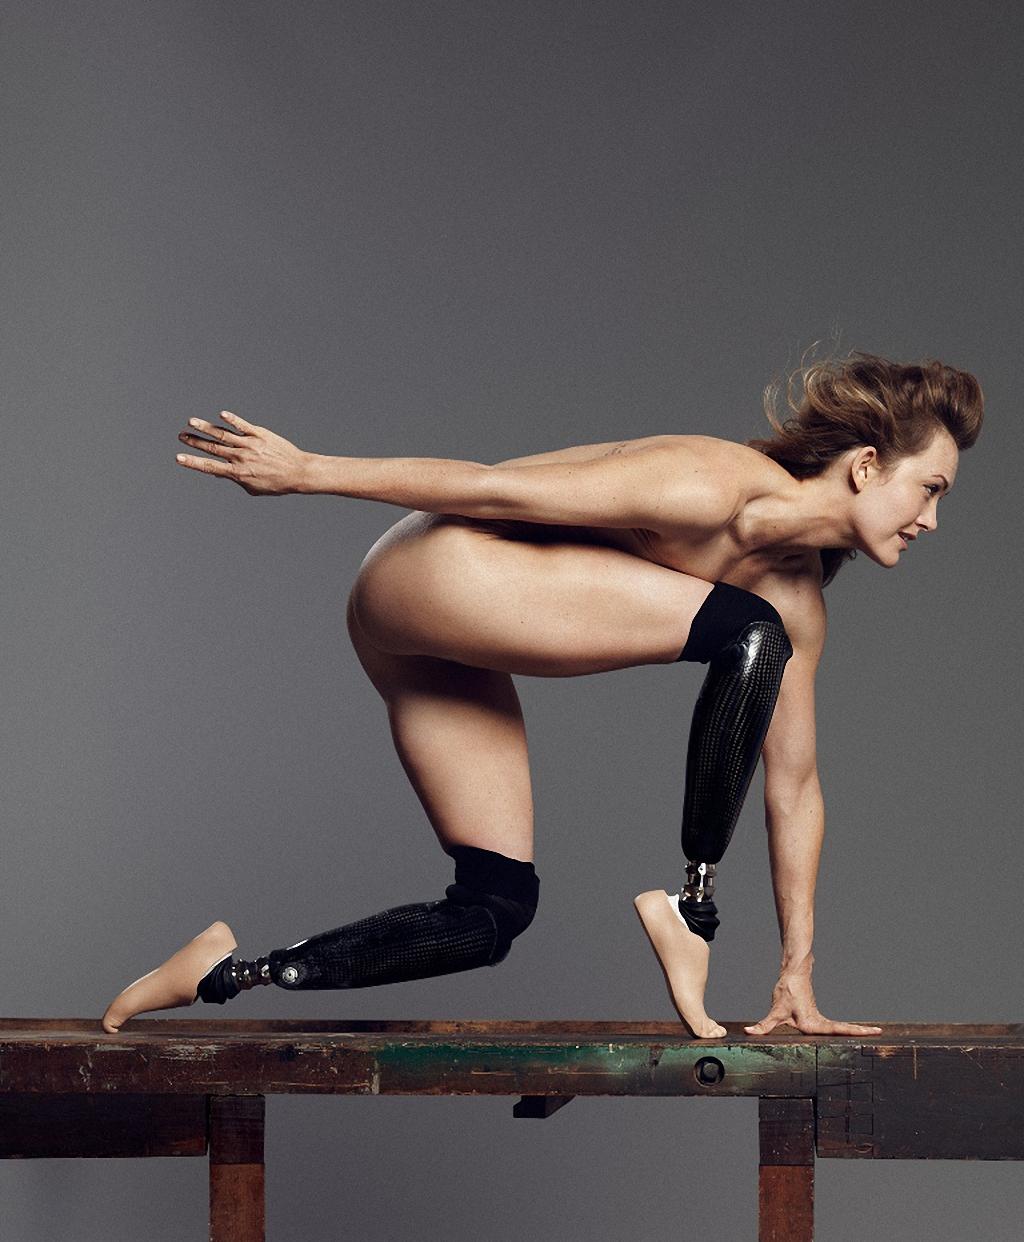 Фото занятия спортом голыми 2 фотография